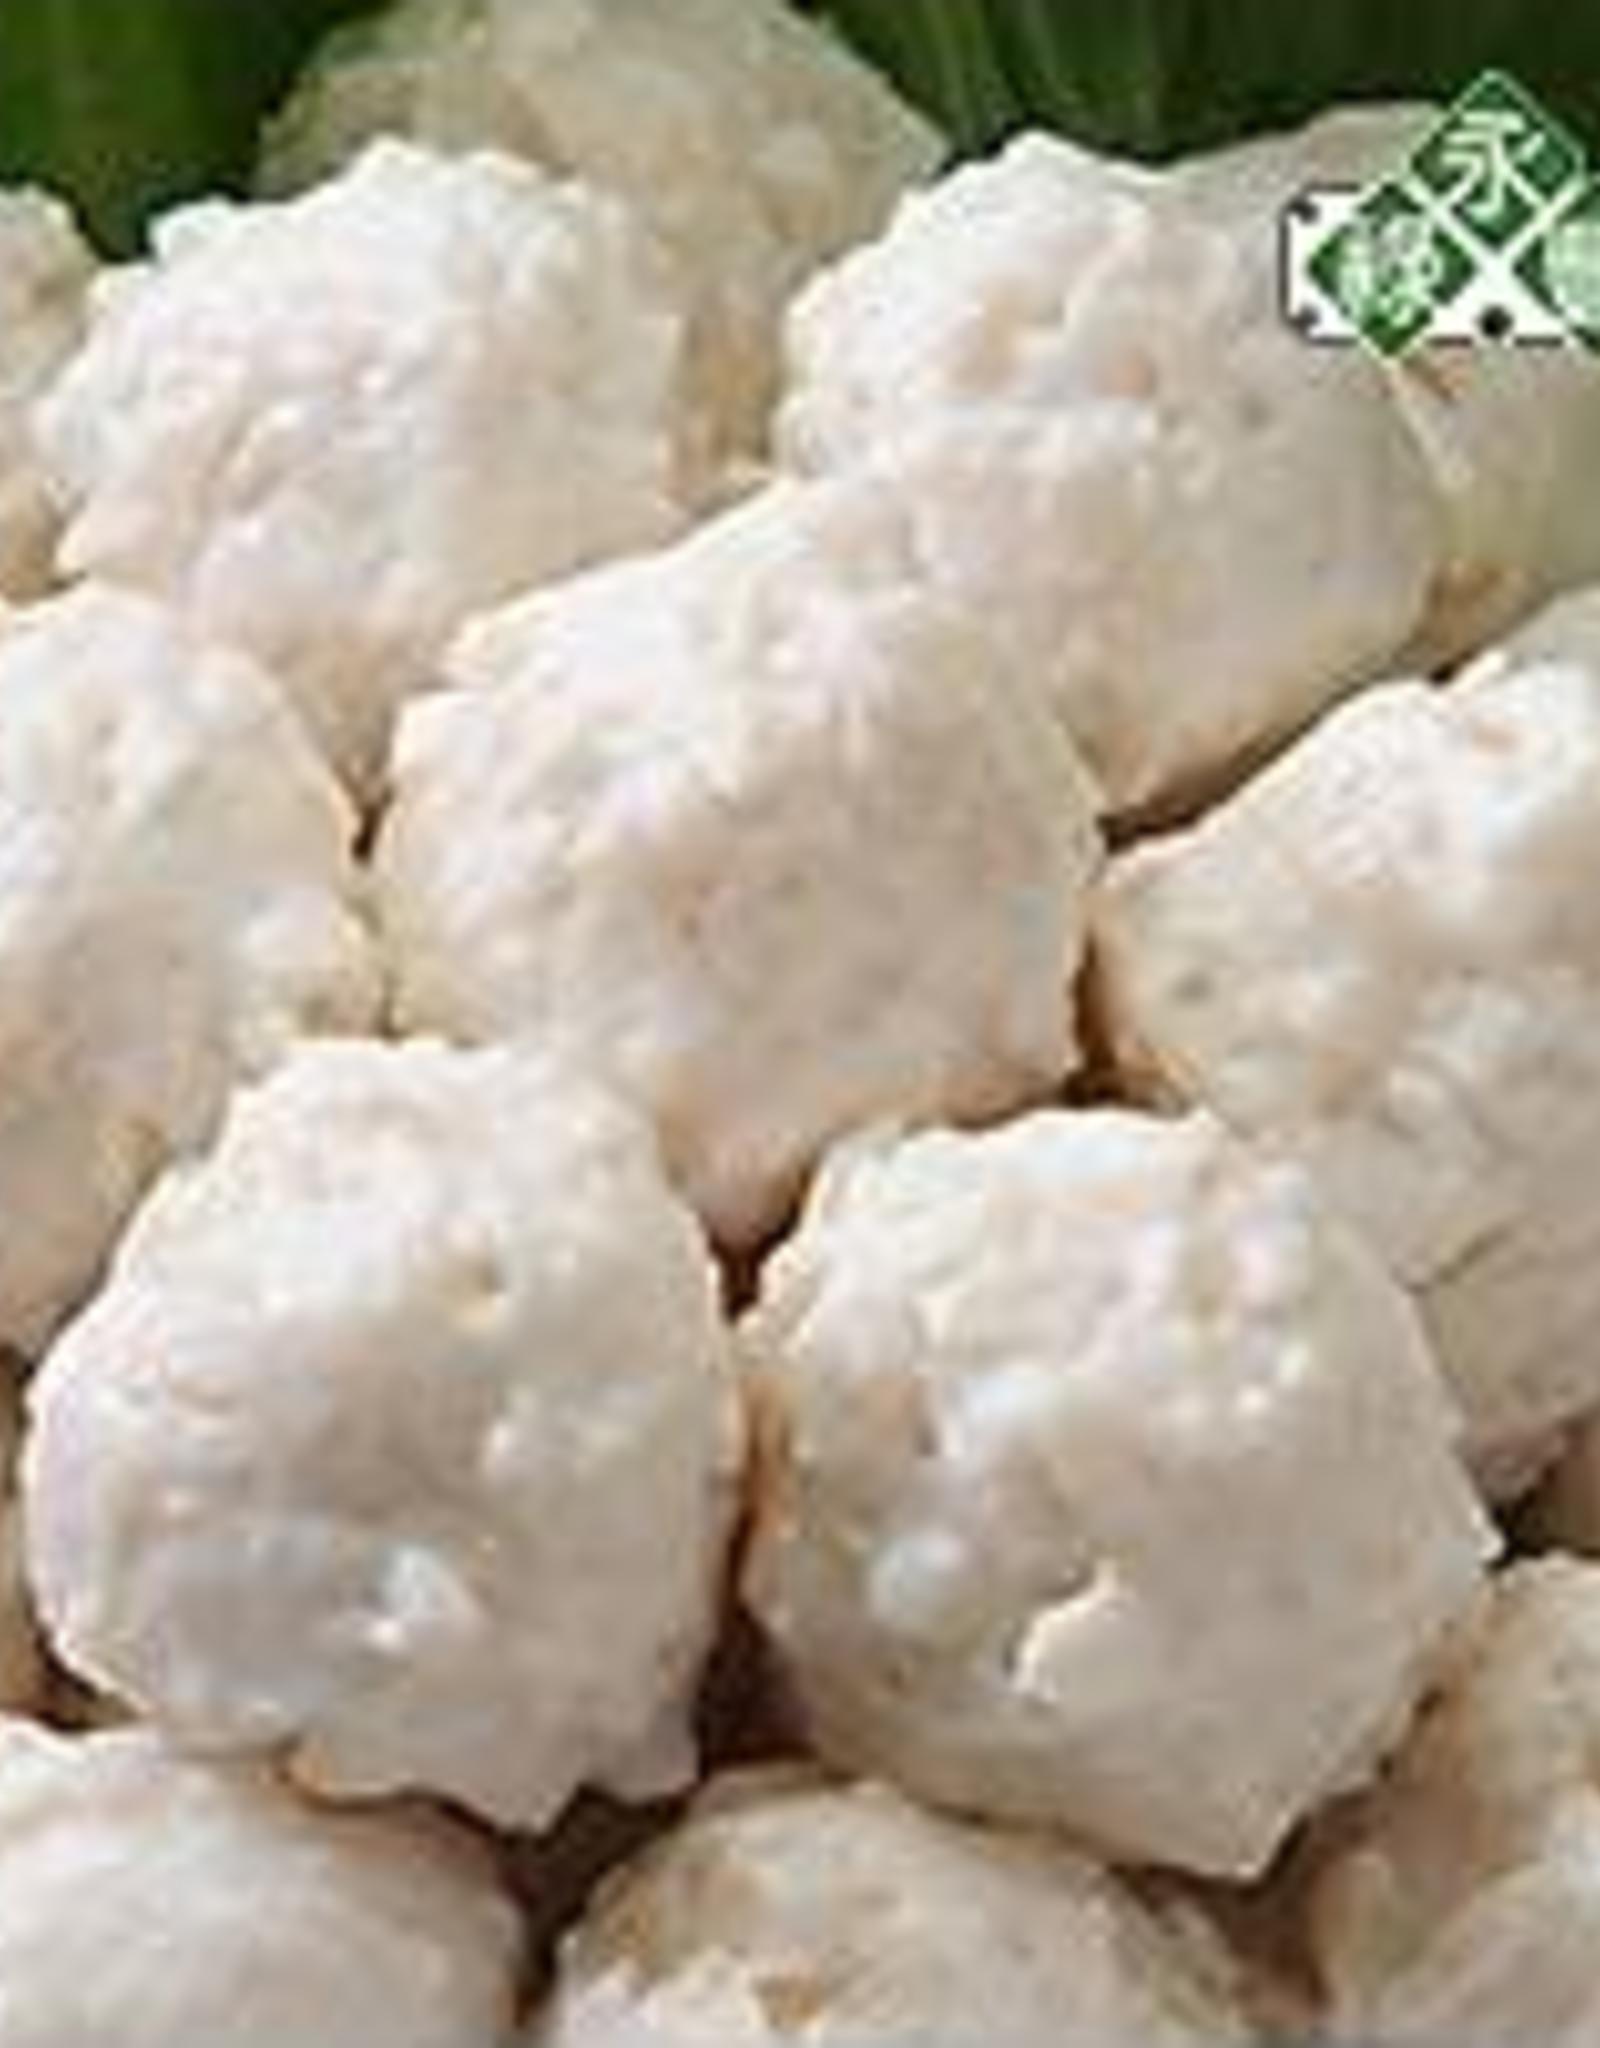 Forever Health * 永祿豐 (FH) Vegan Cuttlefish Ball (S)*(永祿豐) 花枝丸 (S)